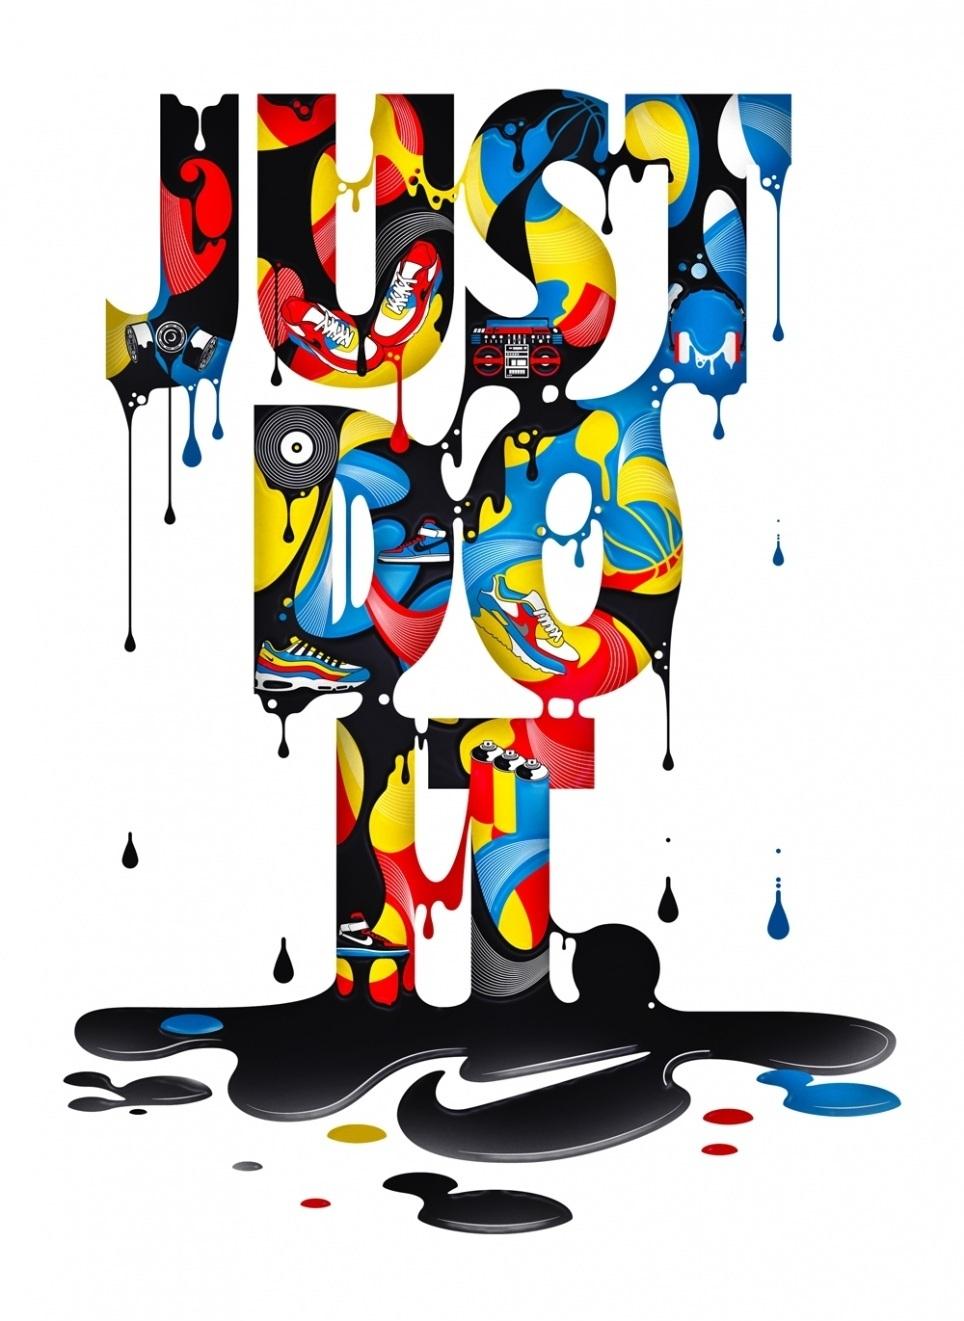 Nike just do it wallpaper mobile sdeerwallpaper 964x1321 voltagebd Image collections